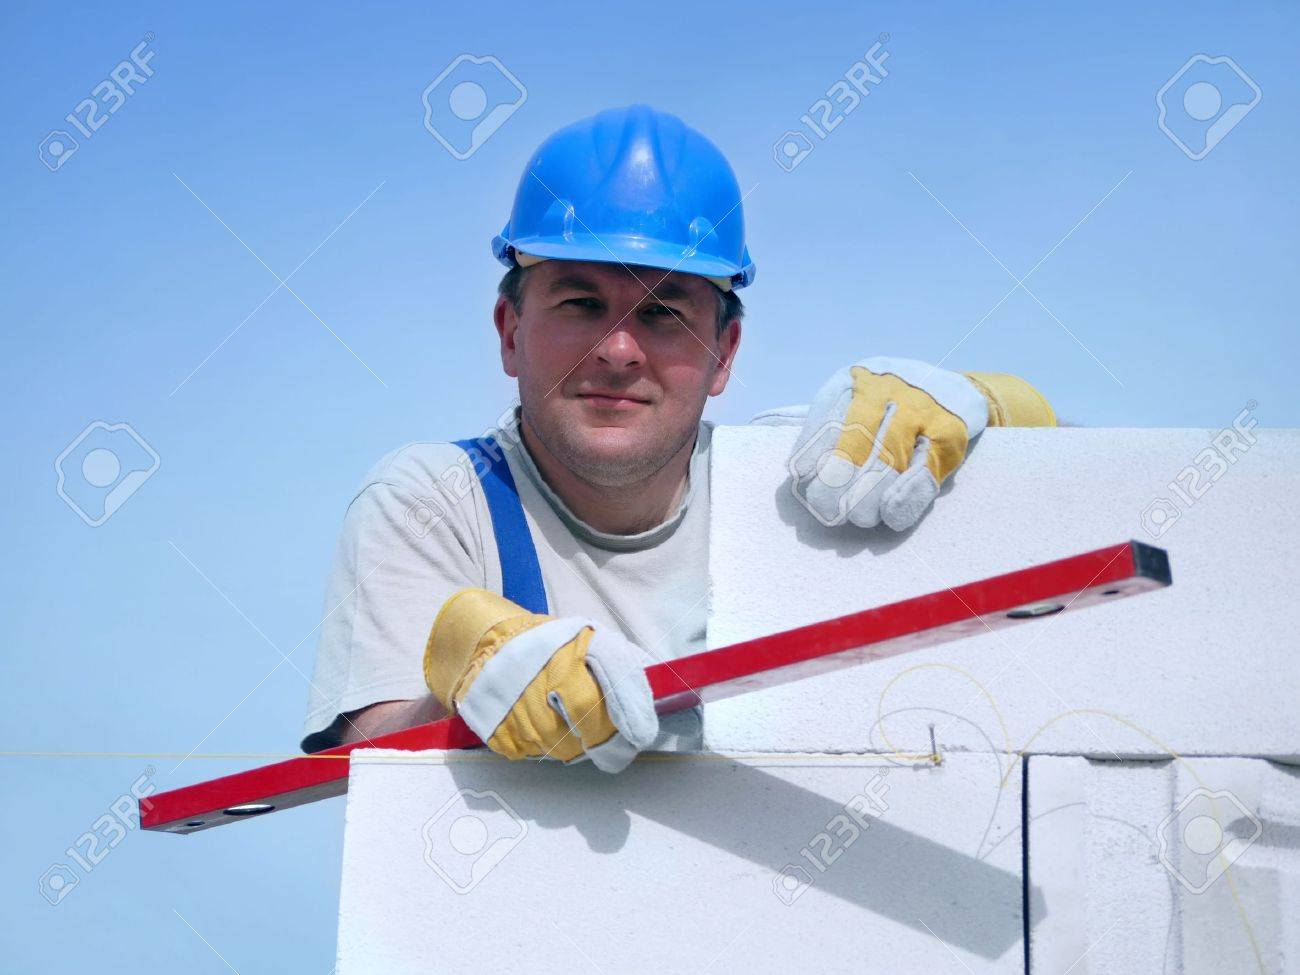 Mason wearing blue helmet posing resting on white block wall holding red level over blue sky Stock Photo - 5026055